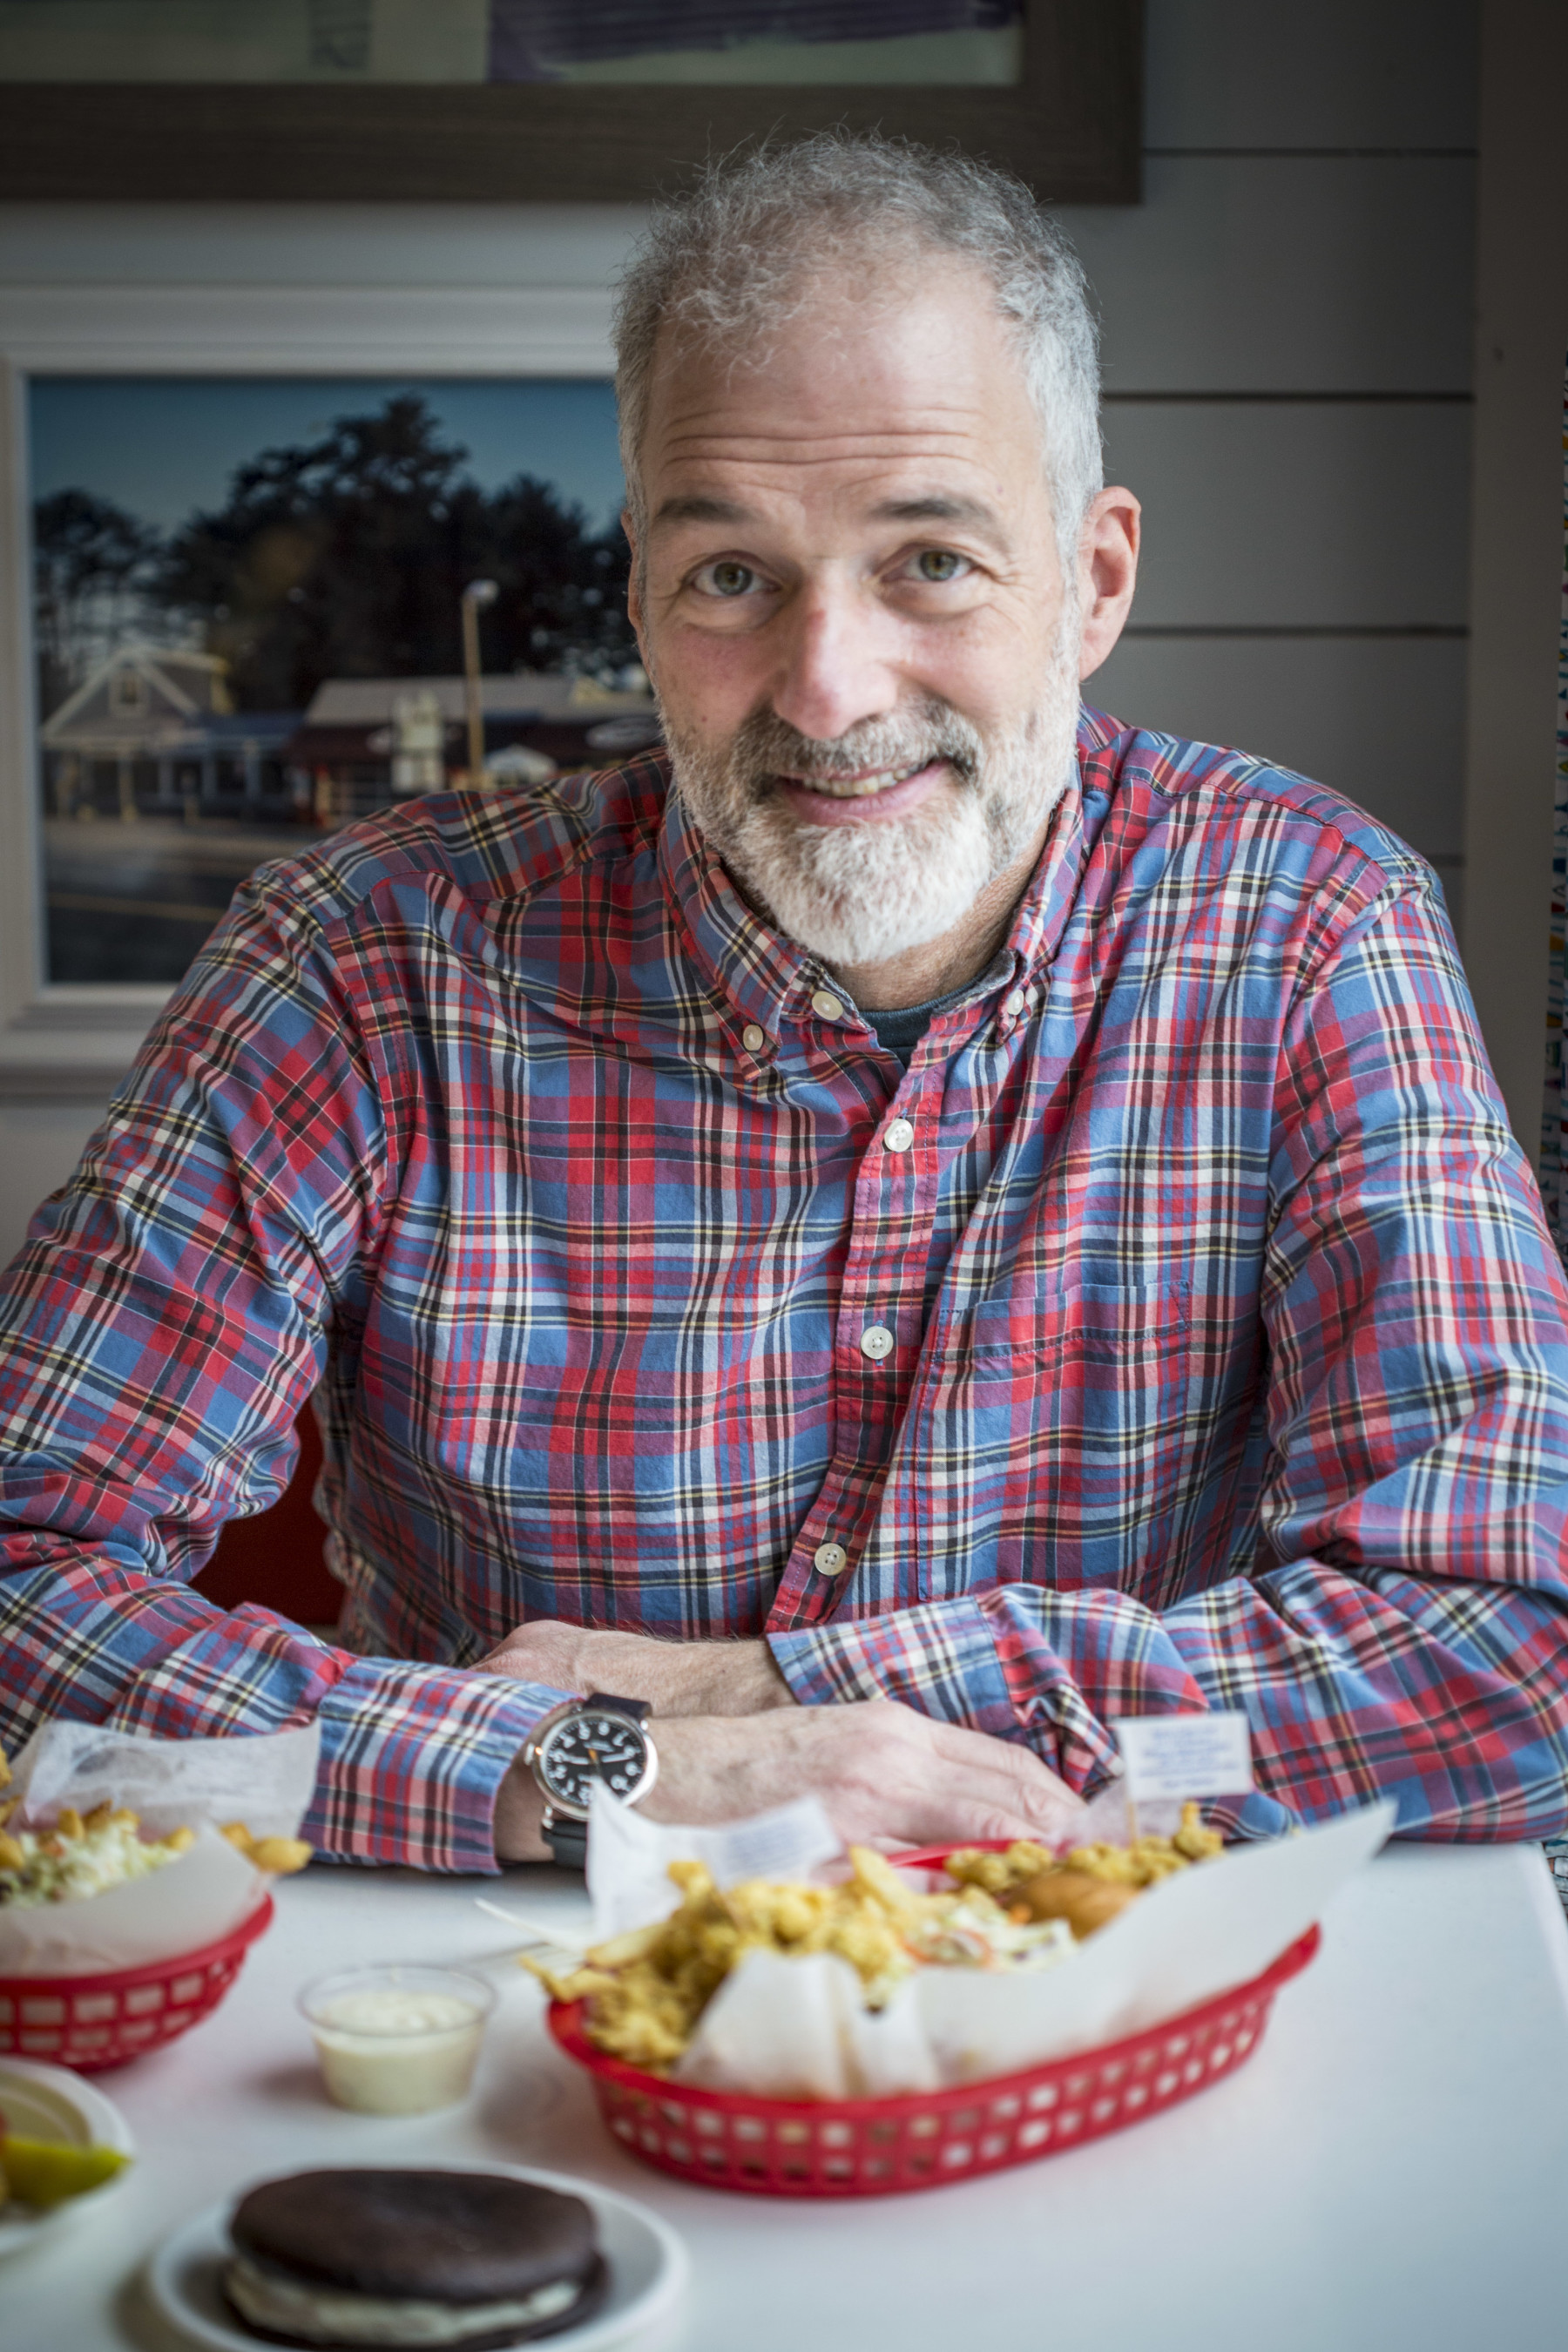 Michael Landgarten_Photo Cred Scott Erb - Christina Valle